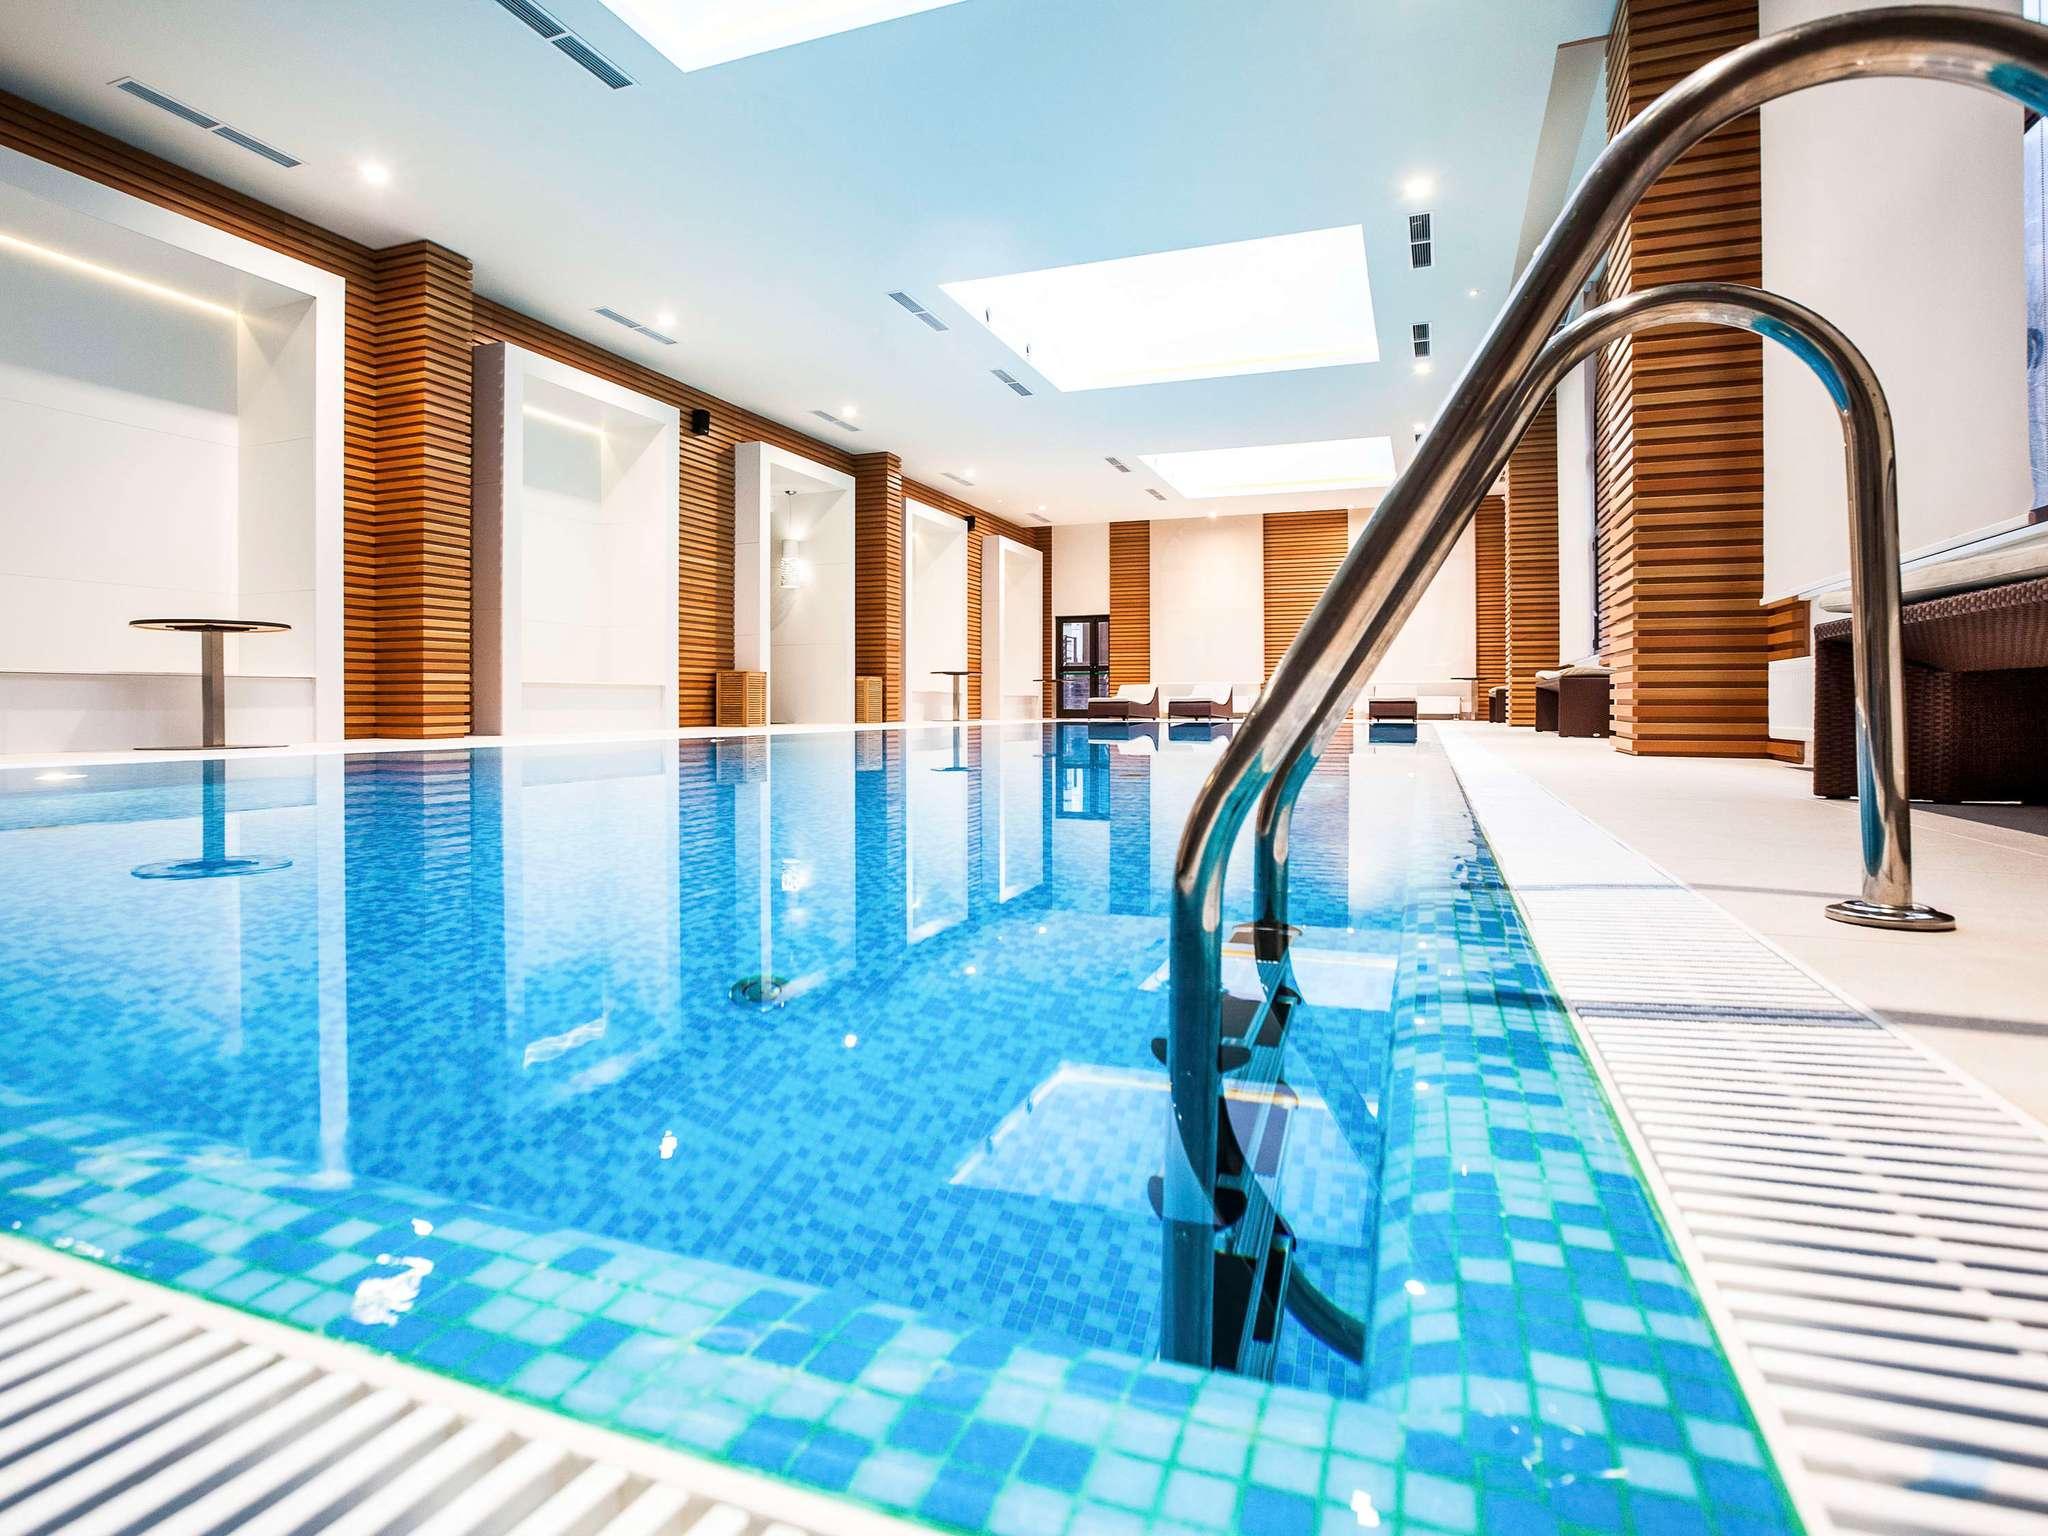 Hôtel - Mercure Rosa Khutor Hotel